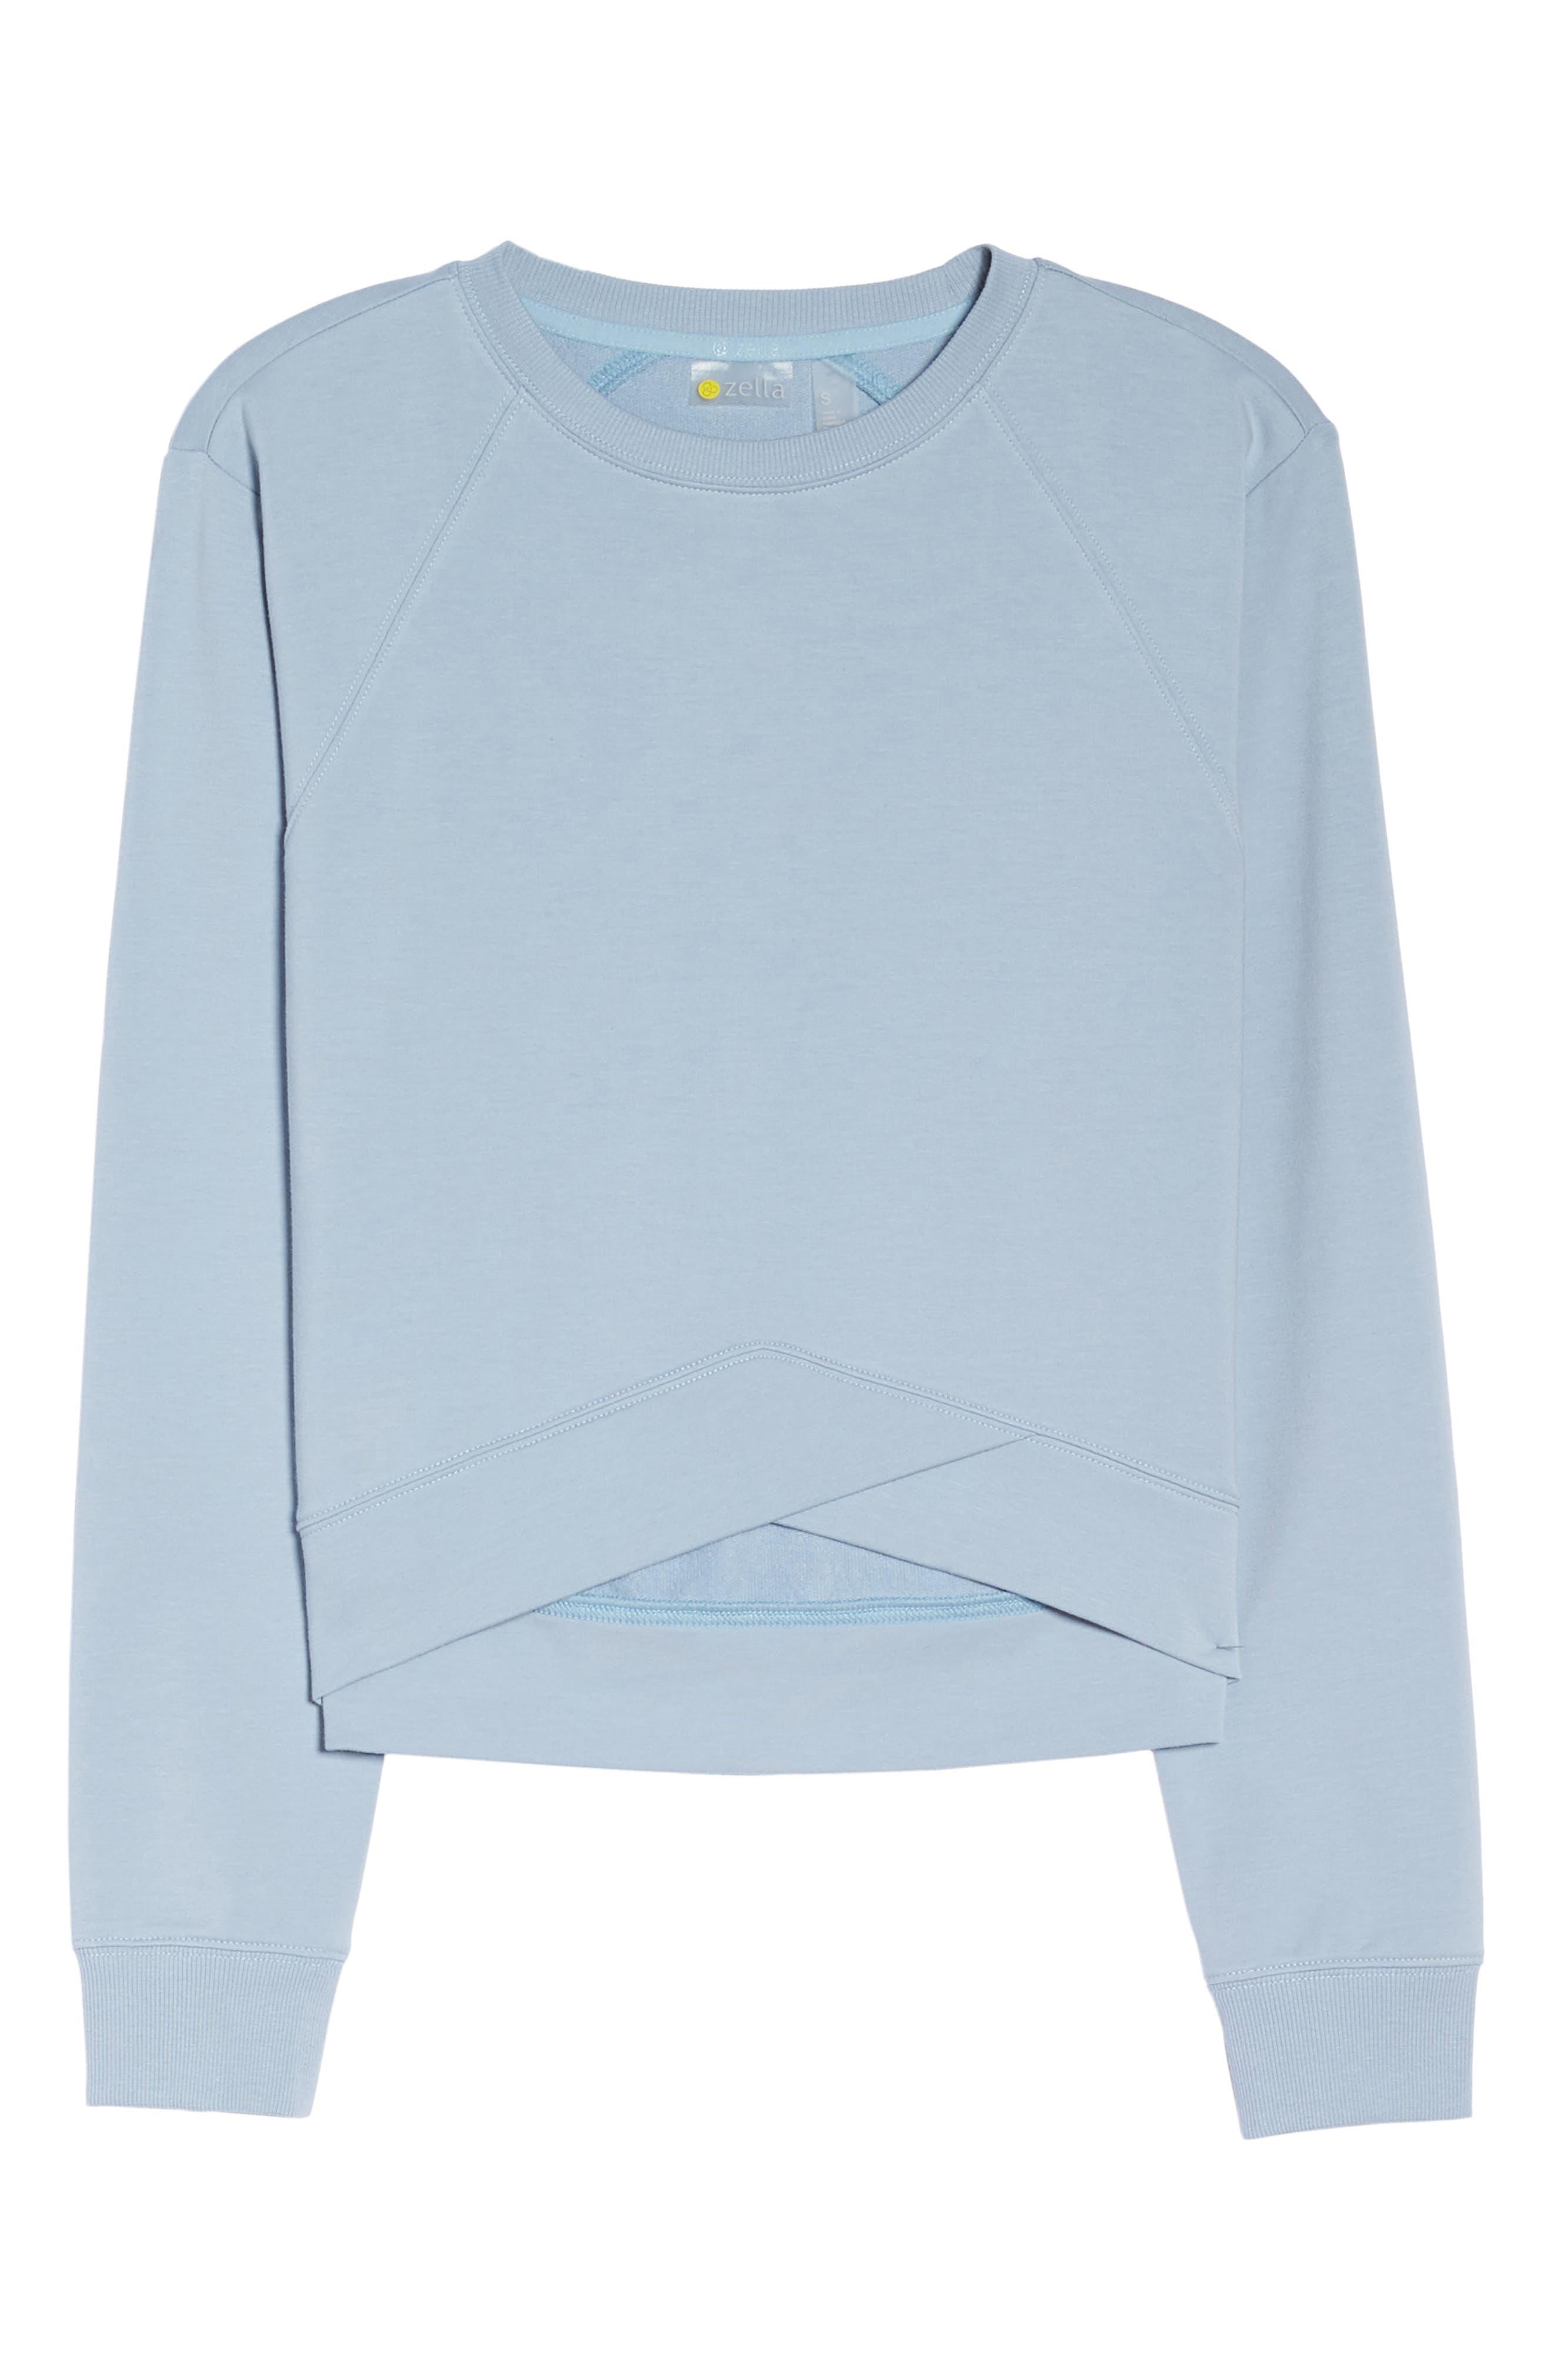 Uplifted Sweatshirt,                             Alternate thumbnail 7, color,                             420